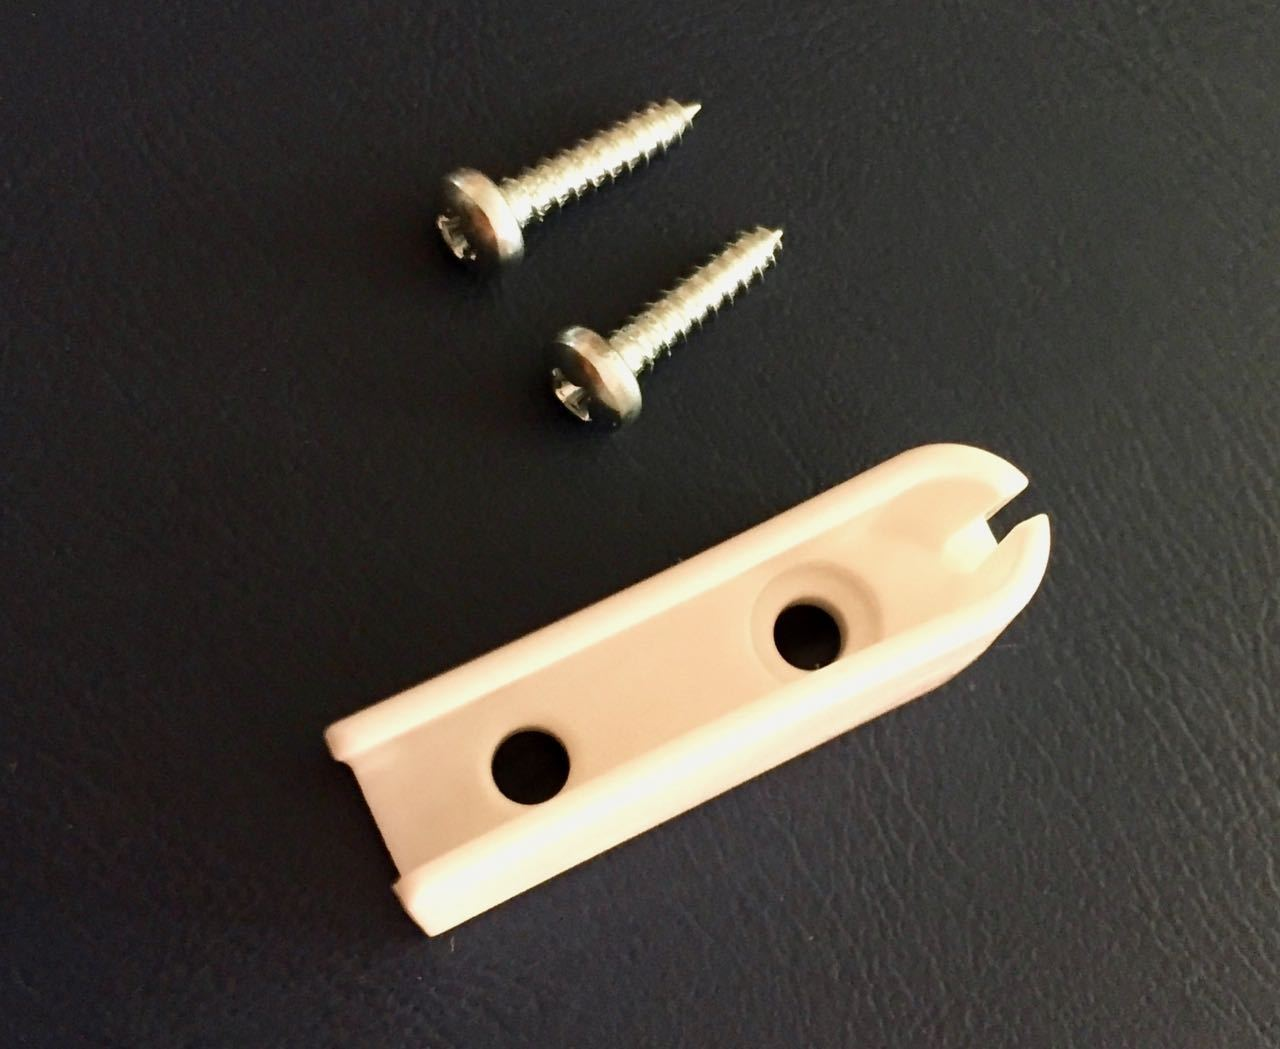 rollo kettenhalter f r 4 5 und 6mm kette. Black Bedroom Furniture Sets. Home Design Ideas